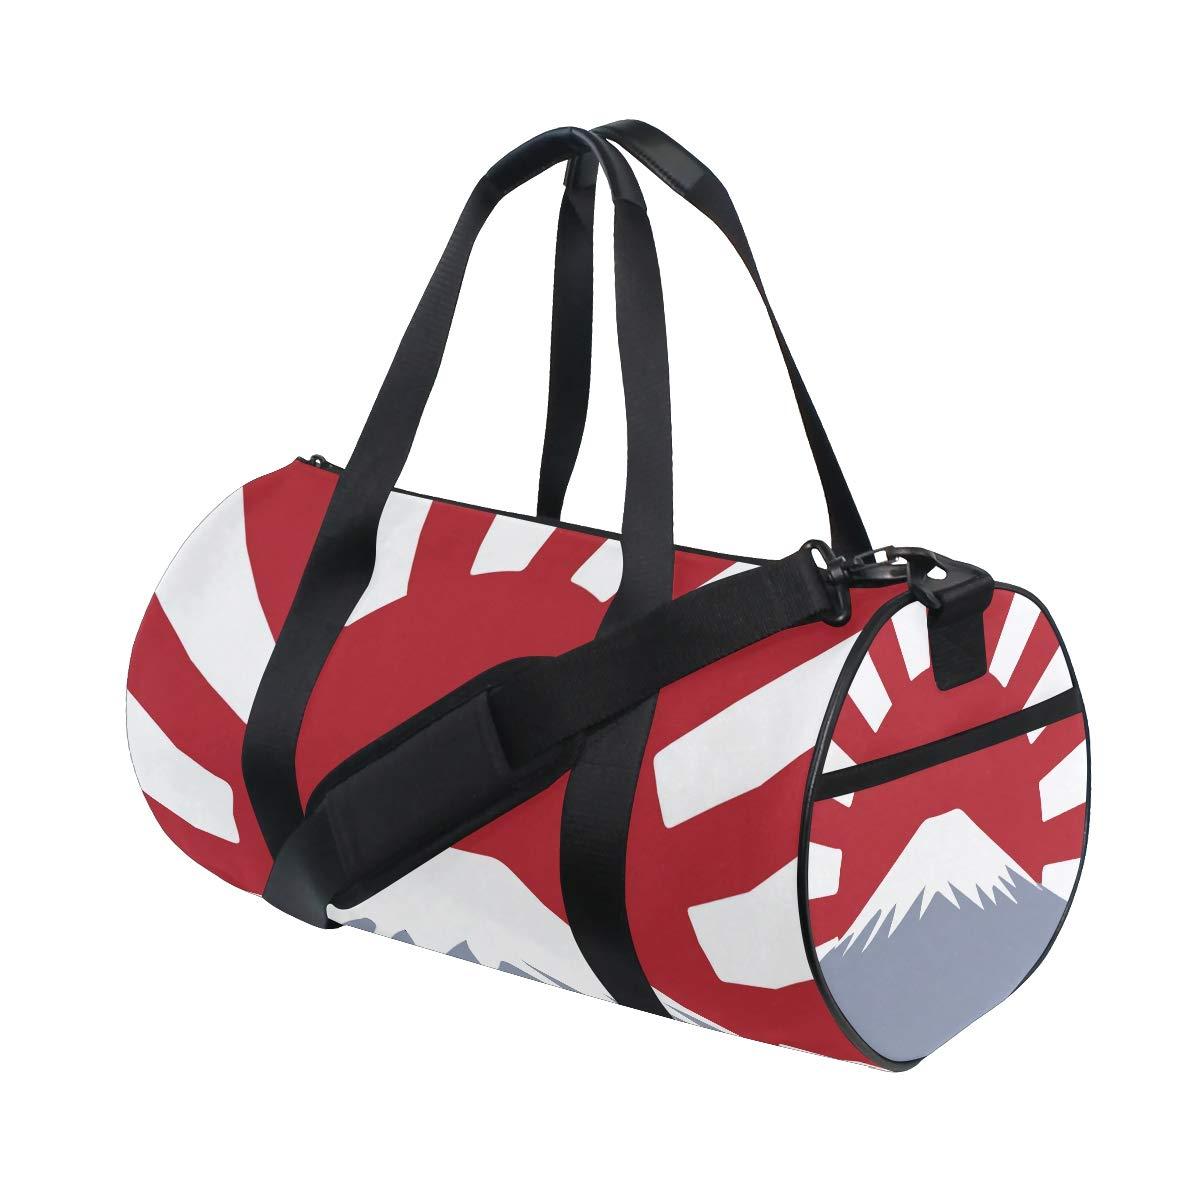 Sports Gym Duffel Barrel Bag Flag Of Japan Fuji Travel Luggage Handbag for Men Women